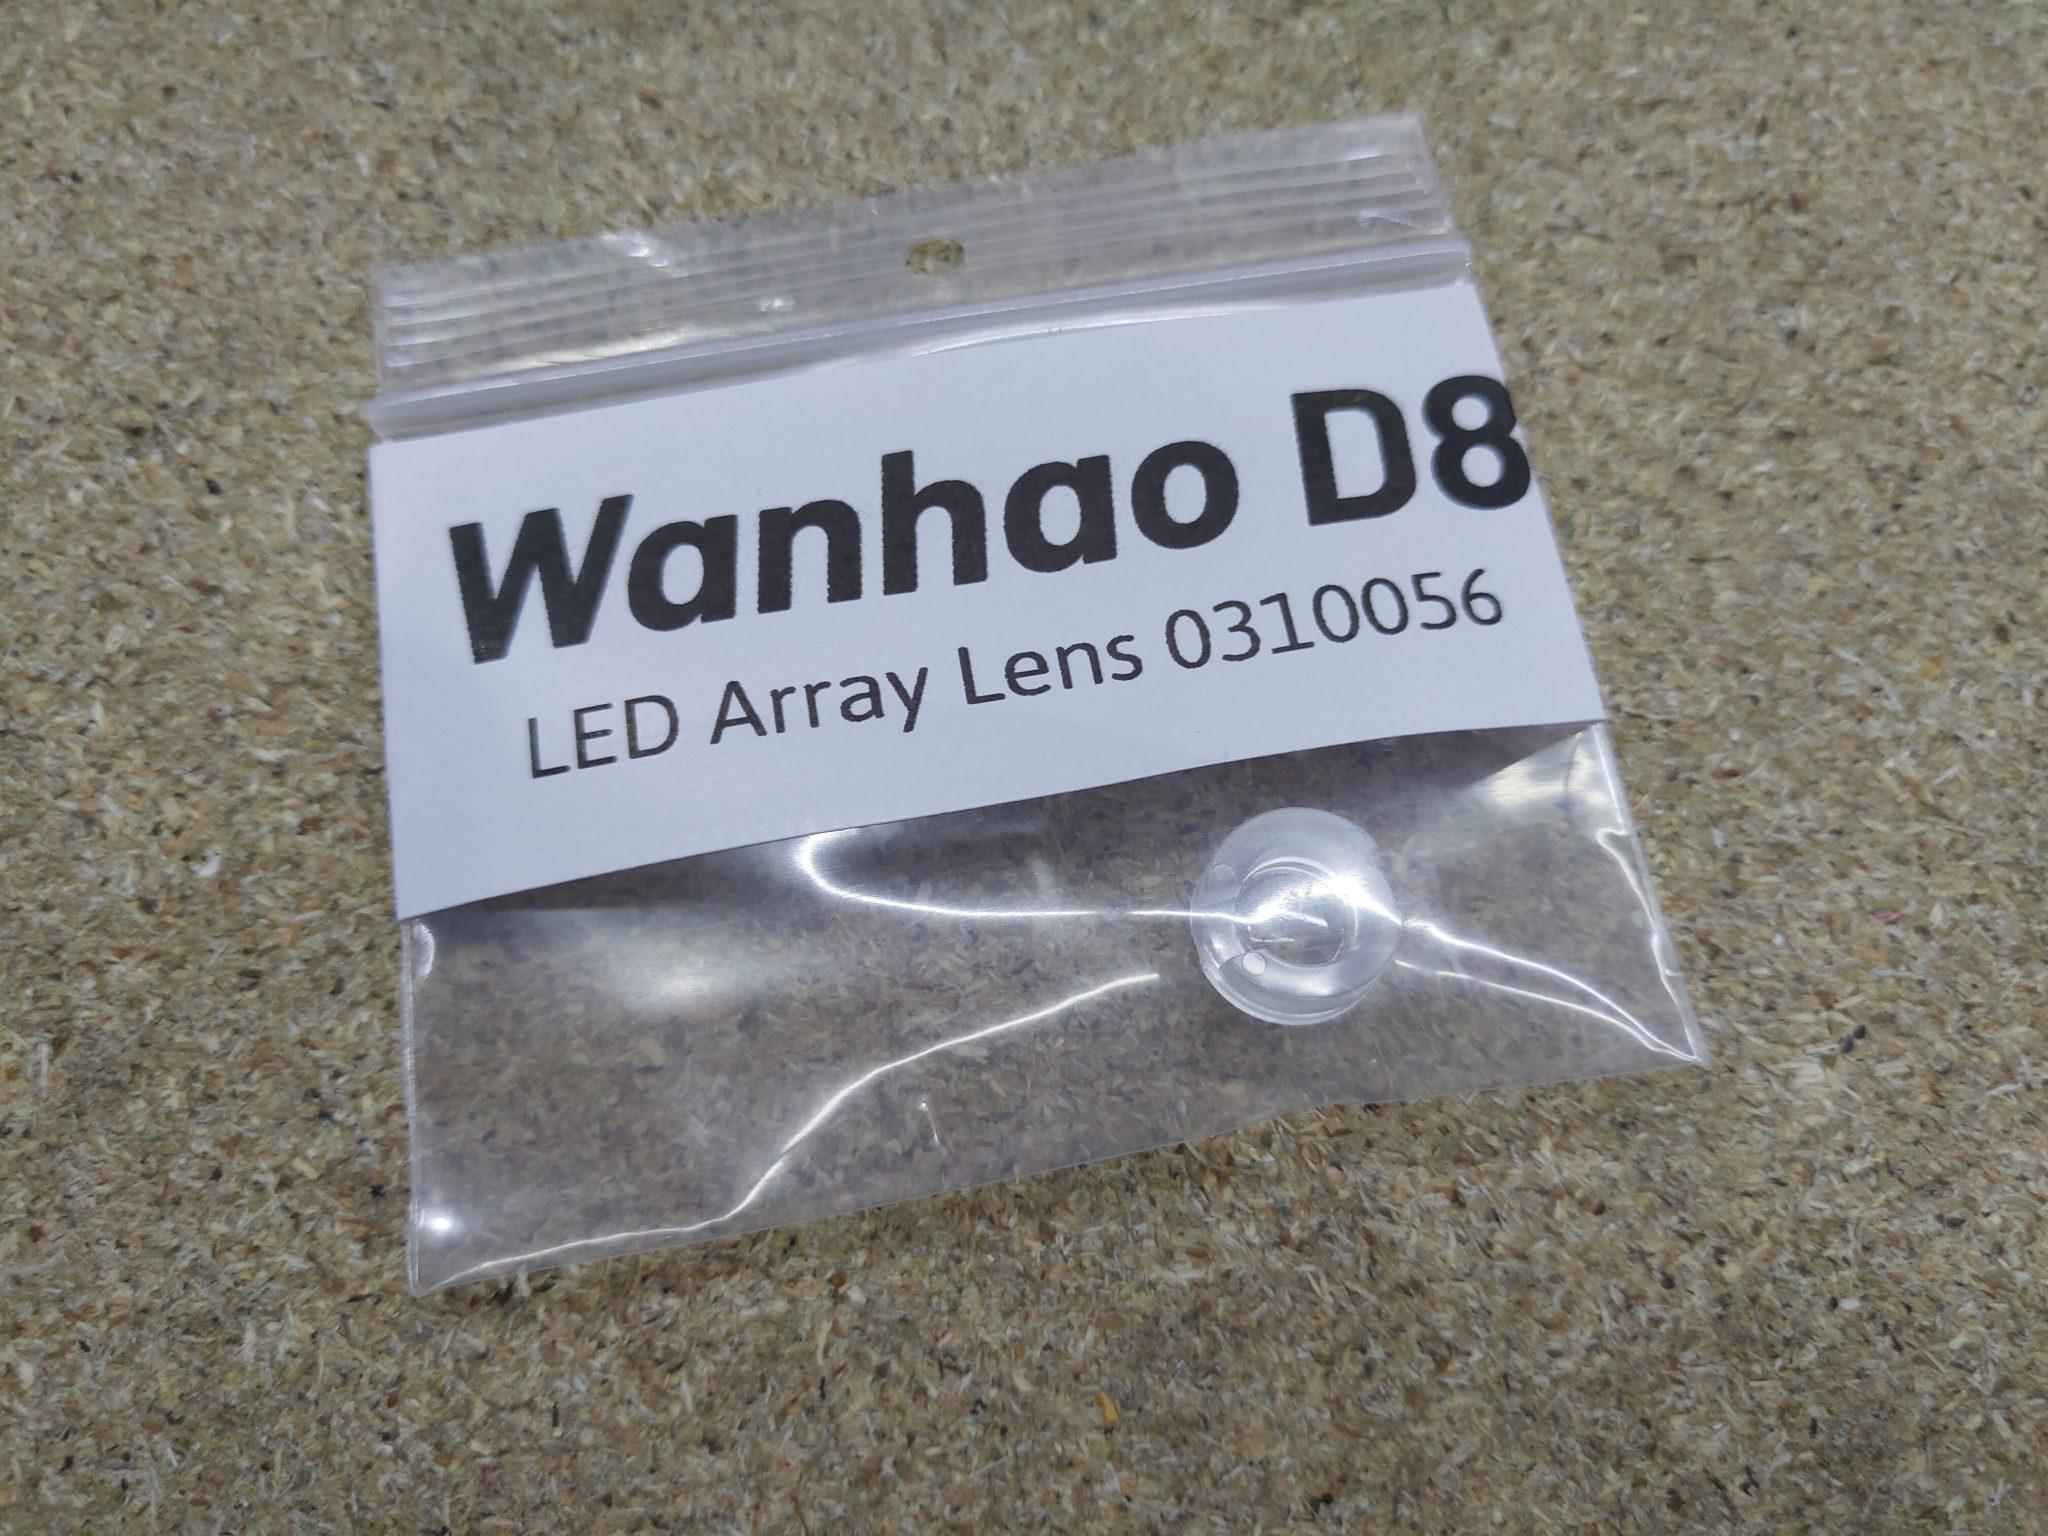 Wanhao D8 LED Array V1 Lens